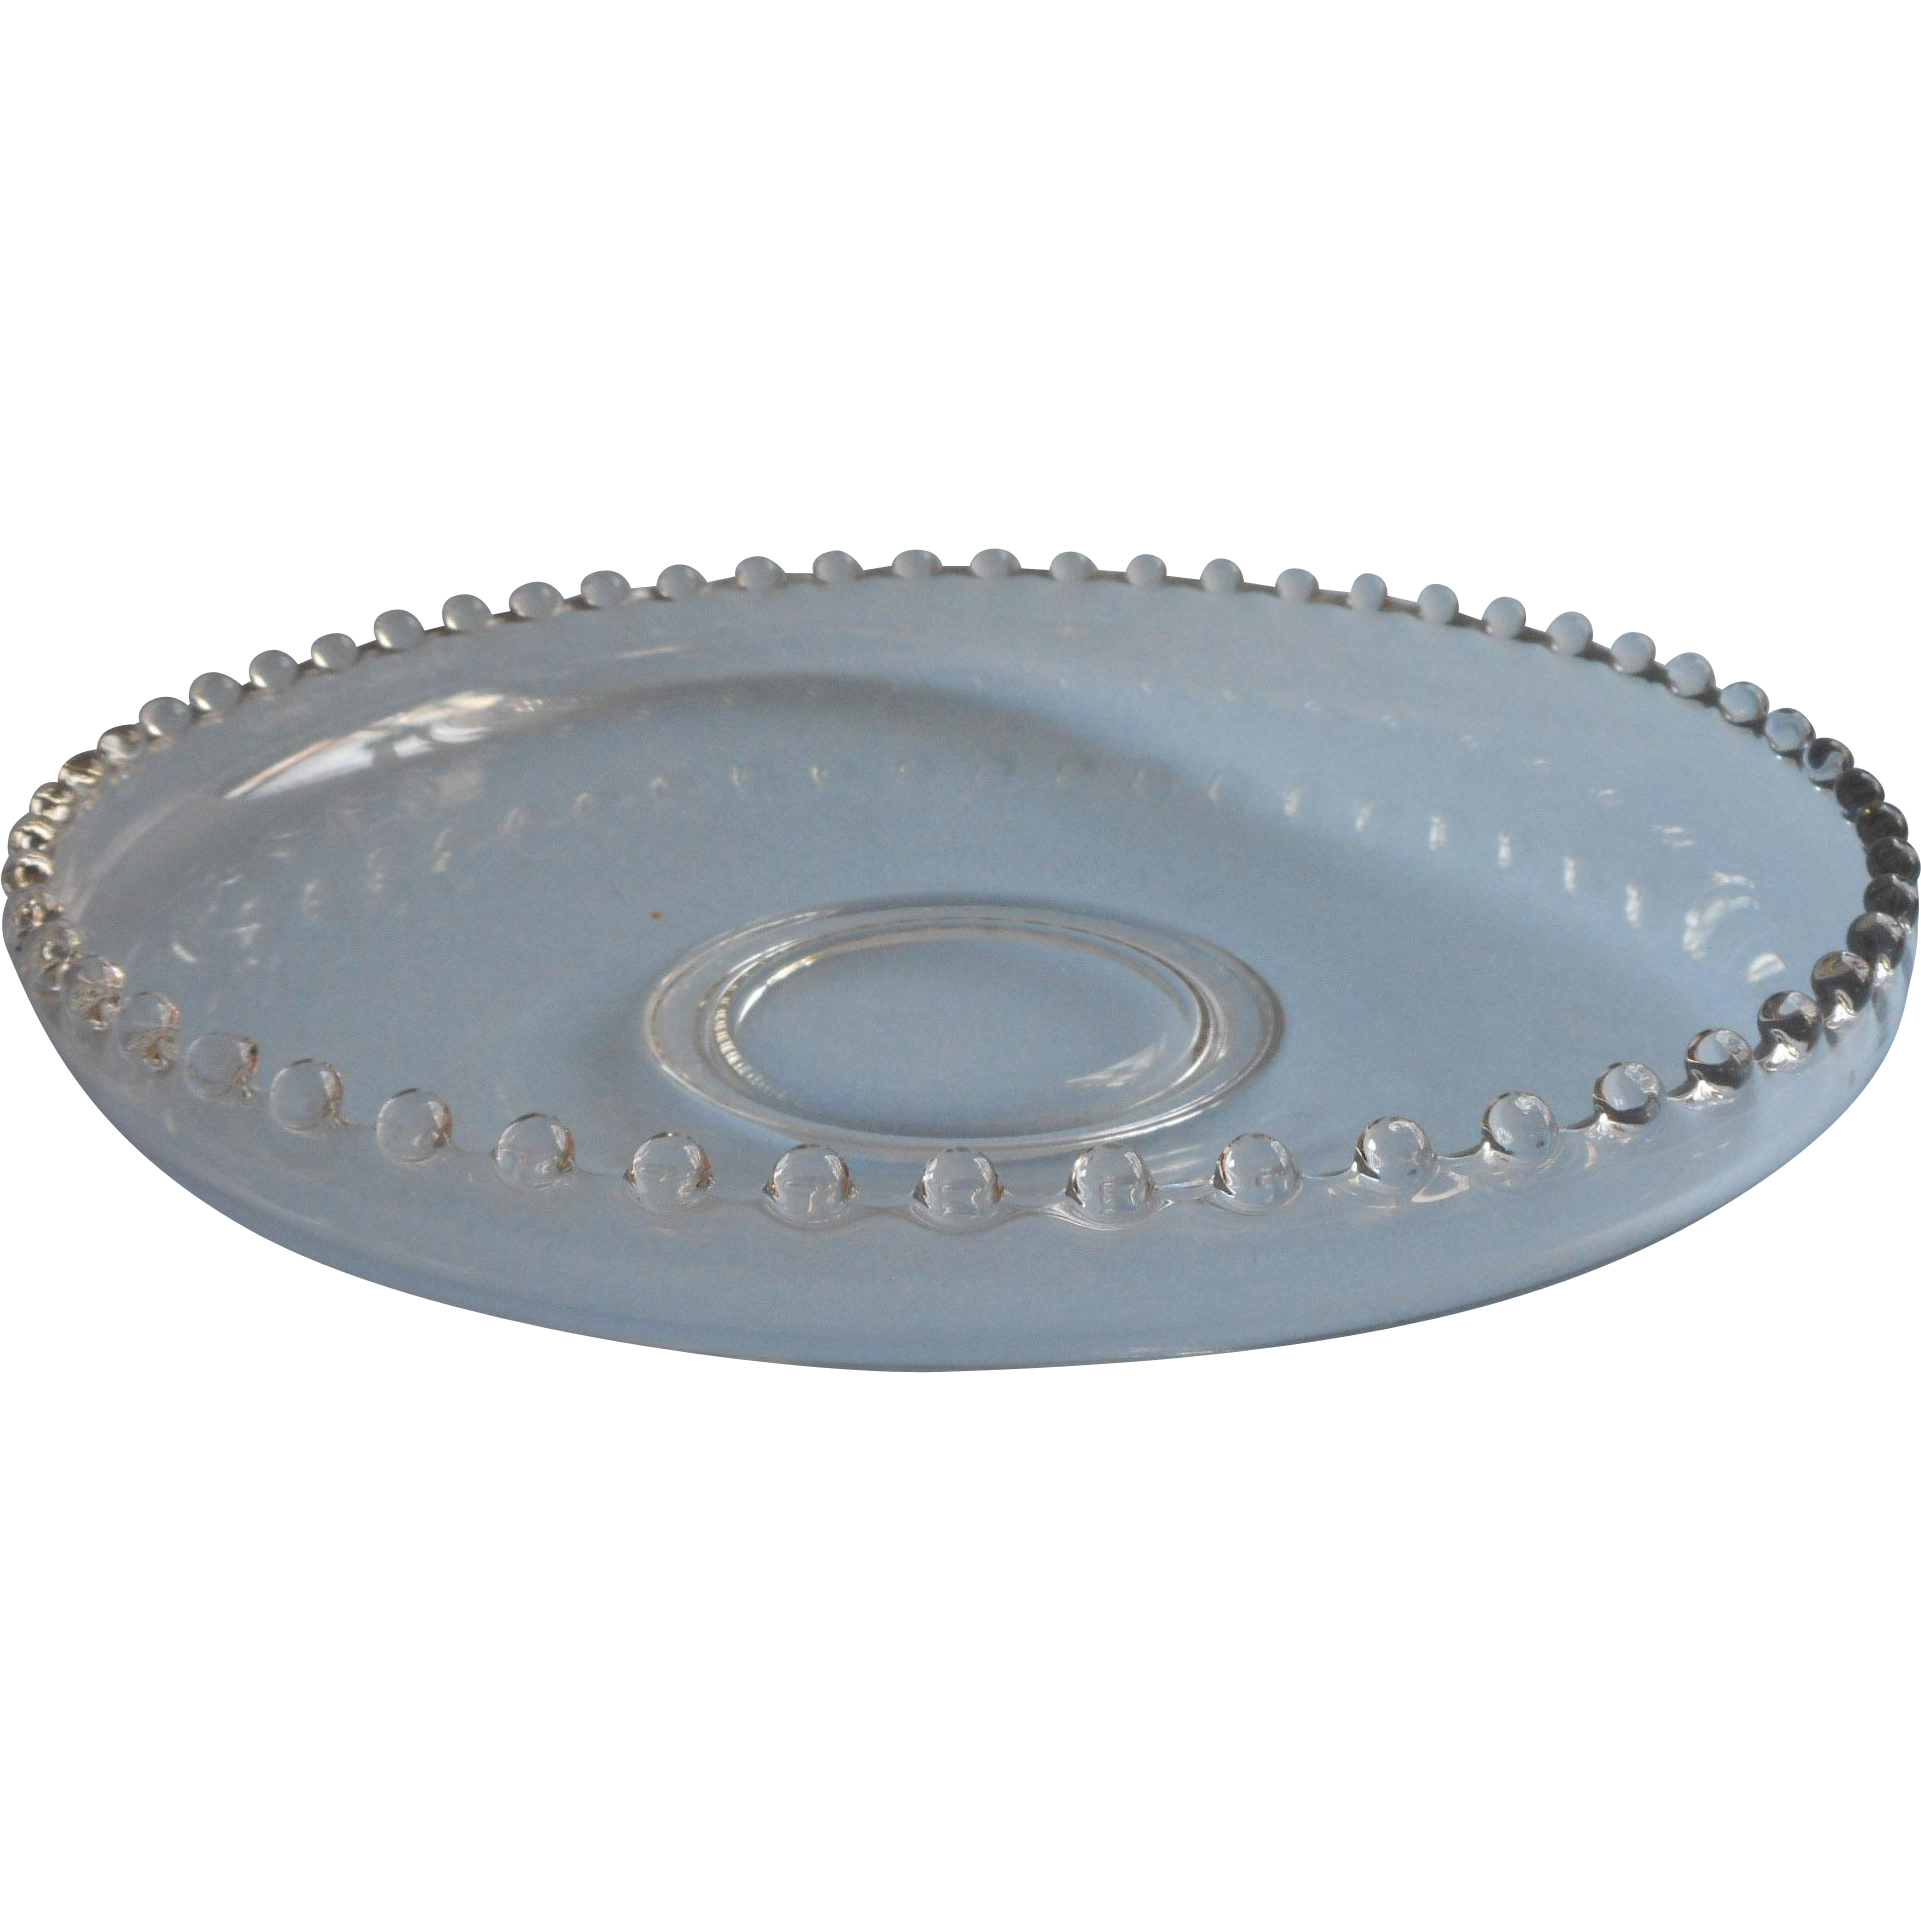 Candlewick shallow console bowl centerpiece serving